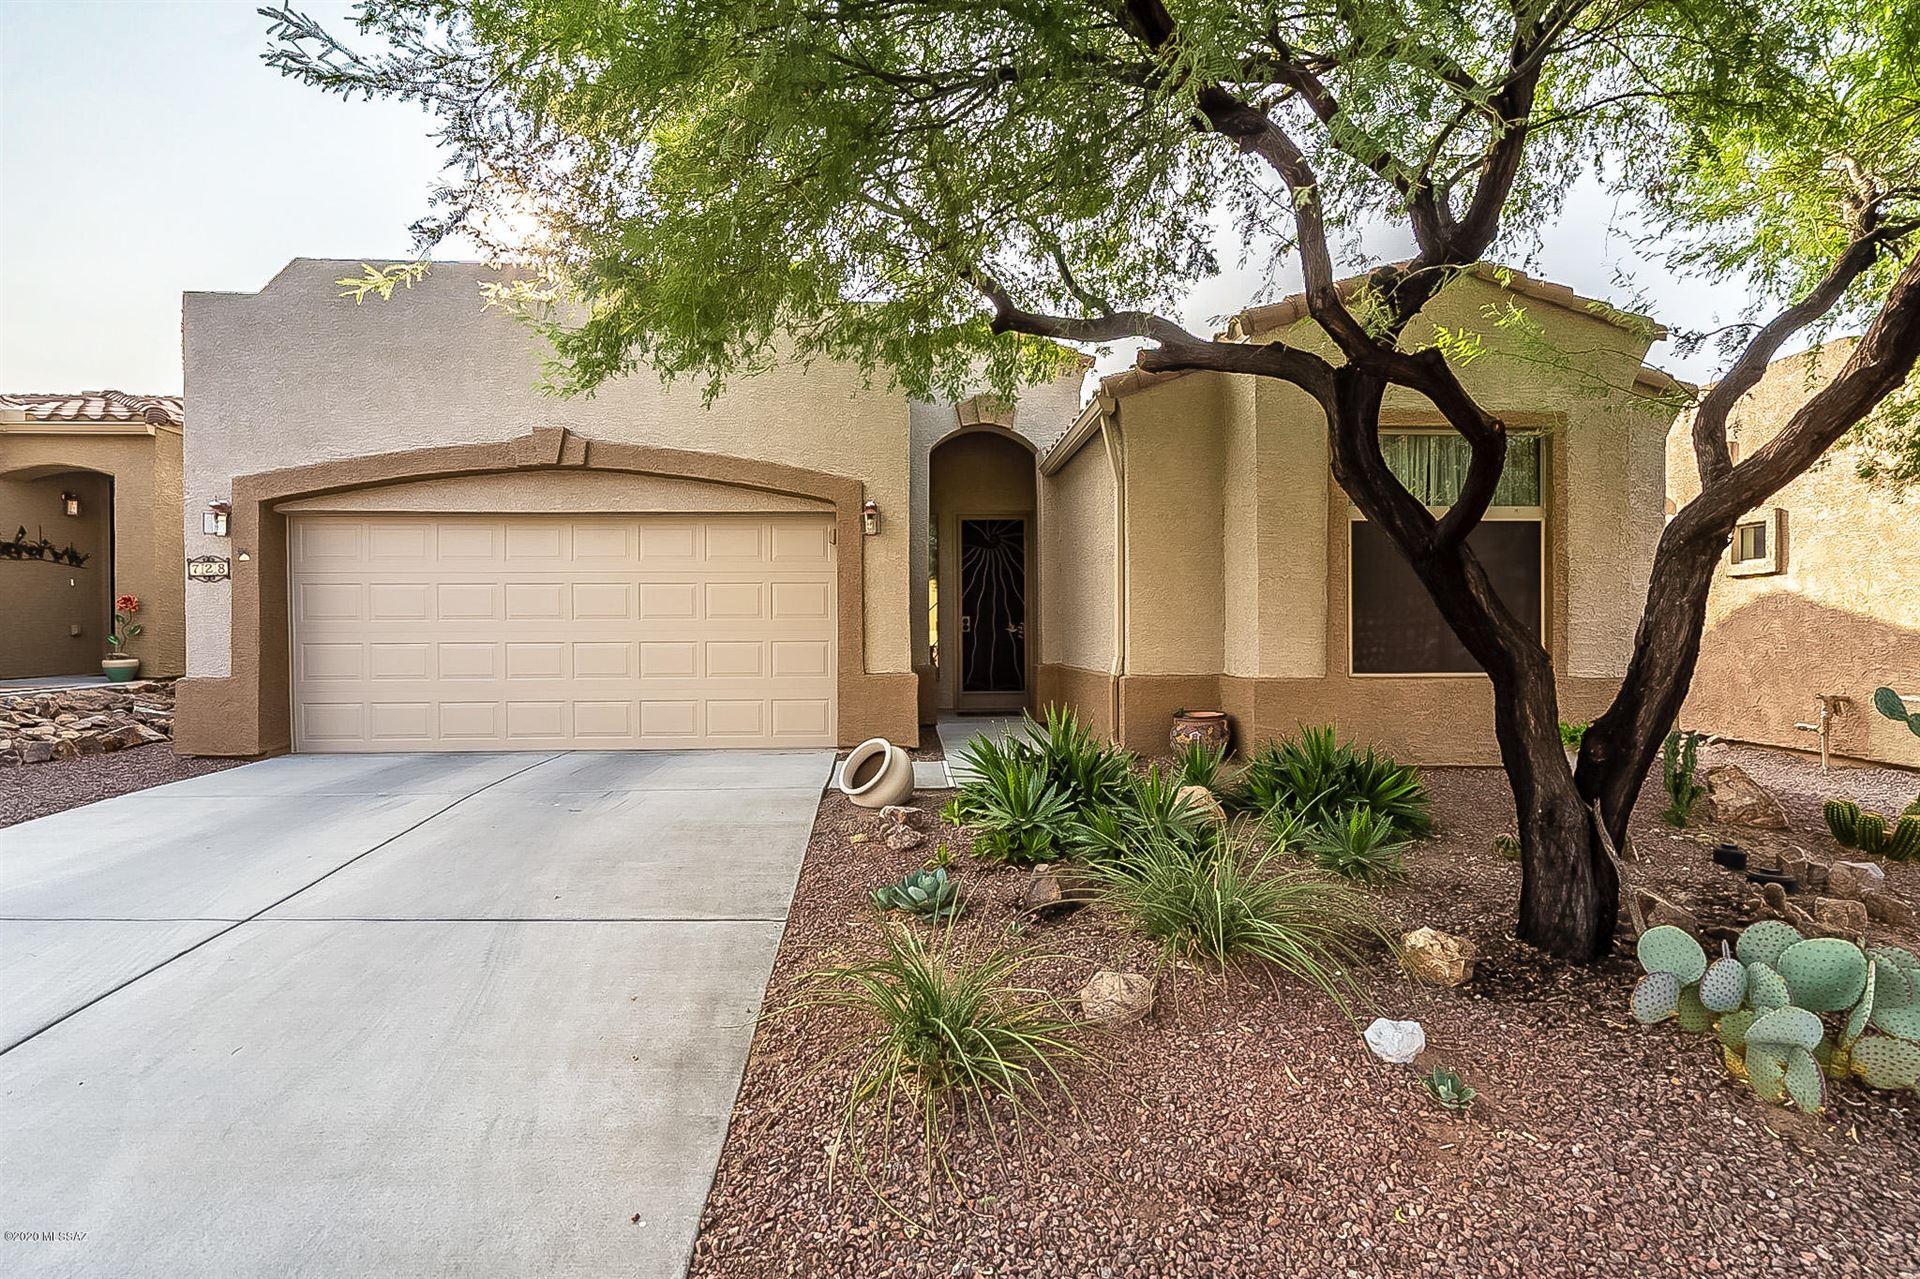 728 W Shadow Wood Street, Green Valley, AZ 85614 - #: 22023126